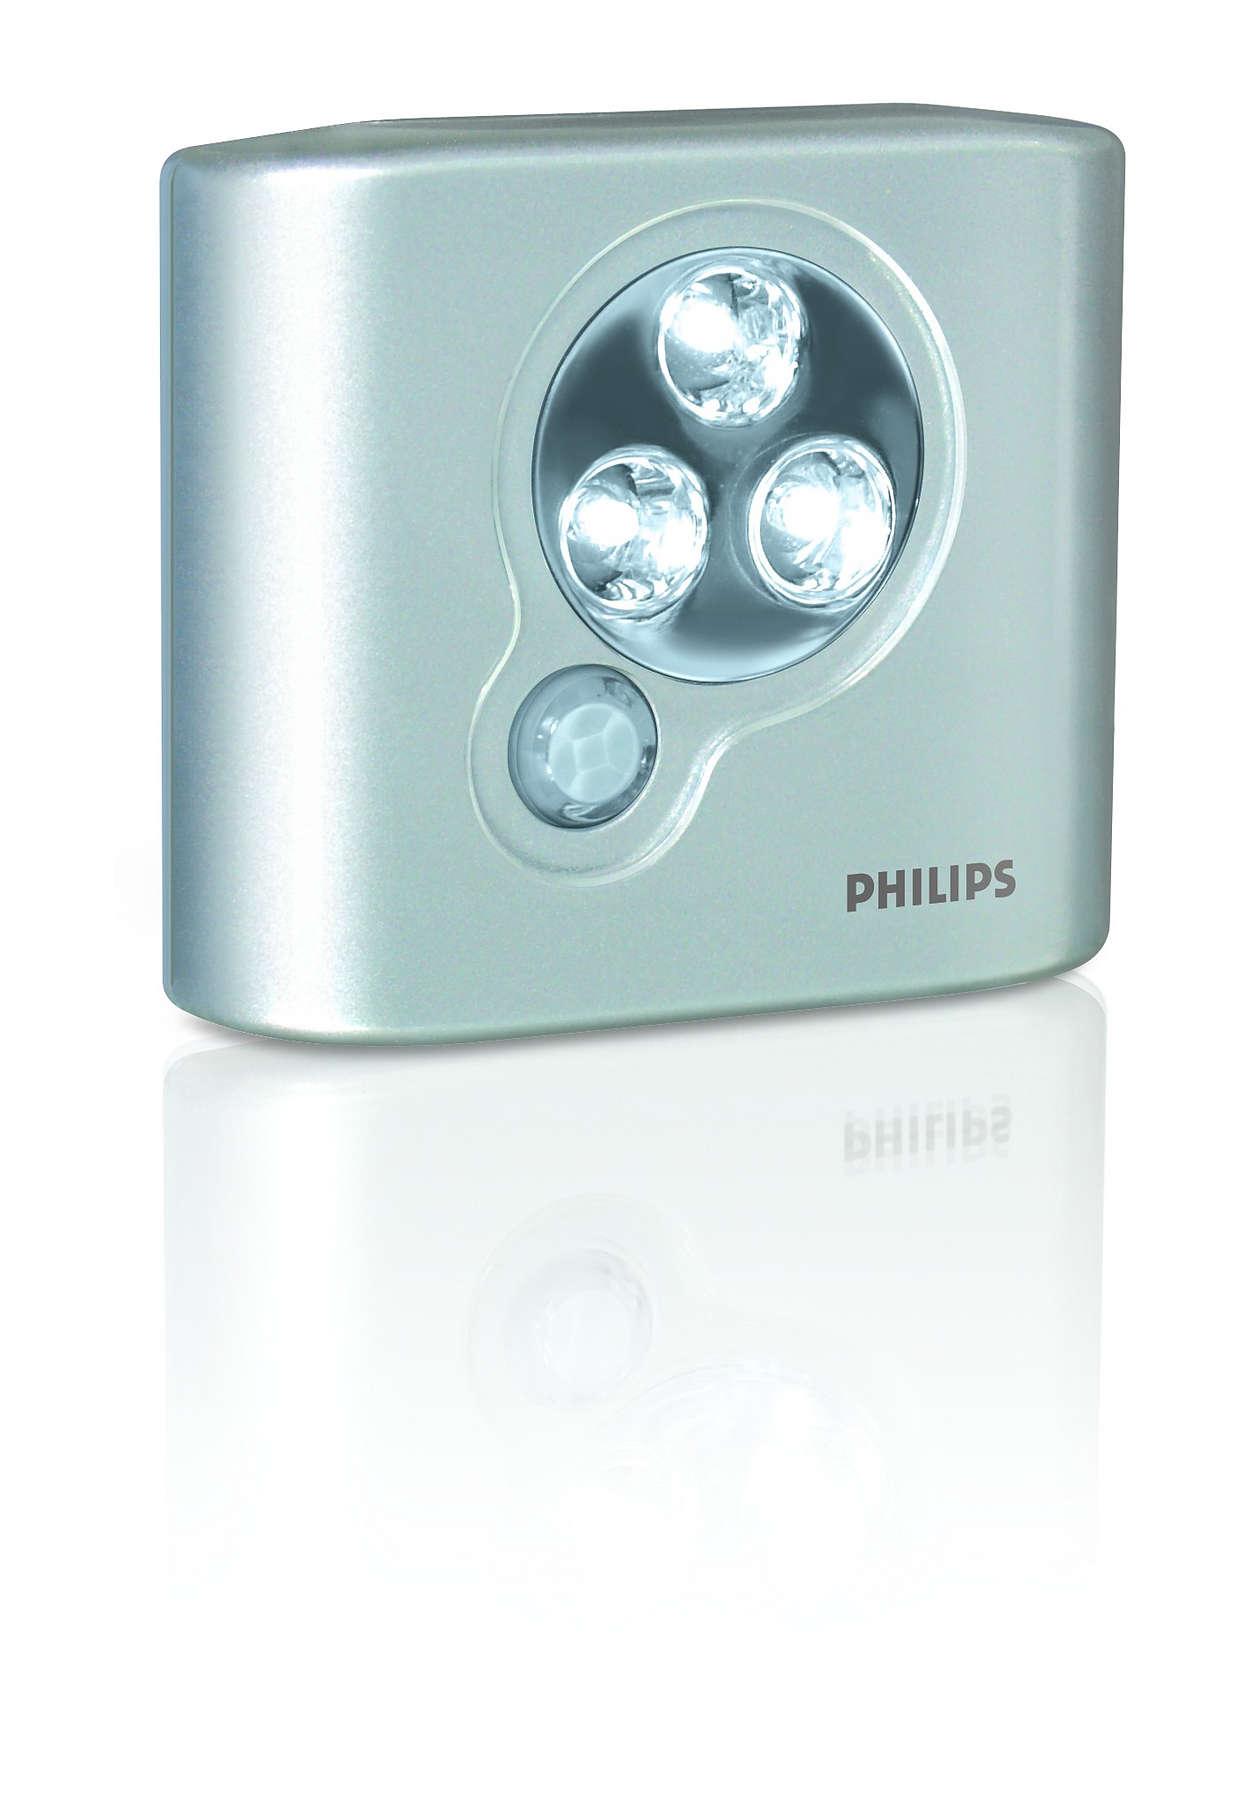 luminaire led piles lac51awsb 10 philips. Black Bedroom Furniture Sets. Home Design Ideas